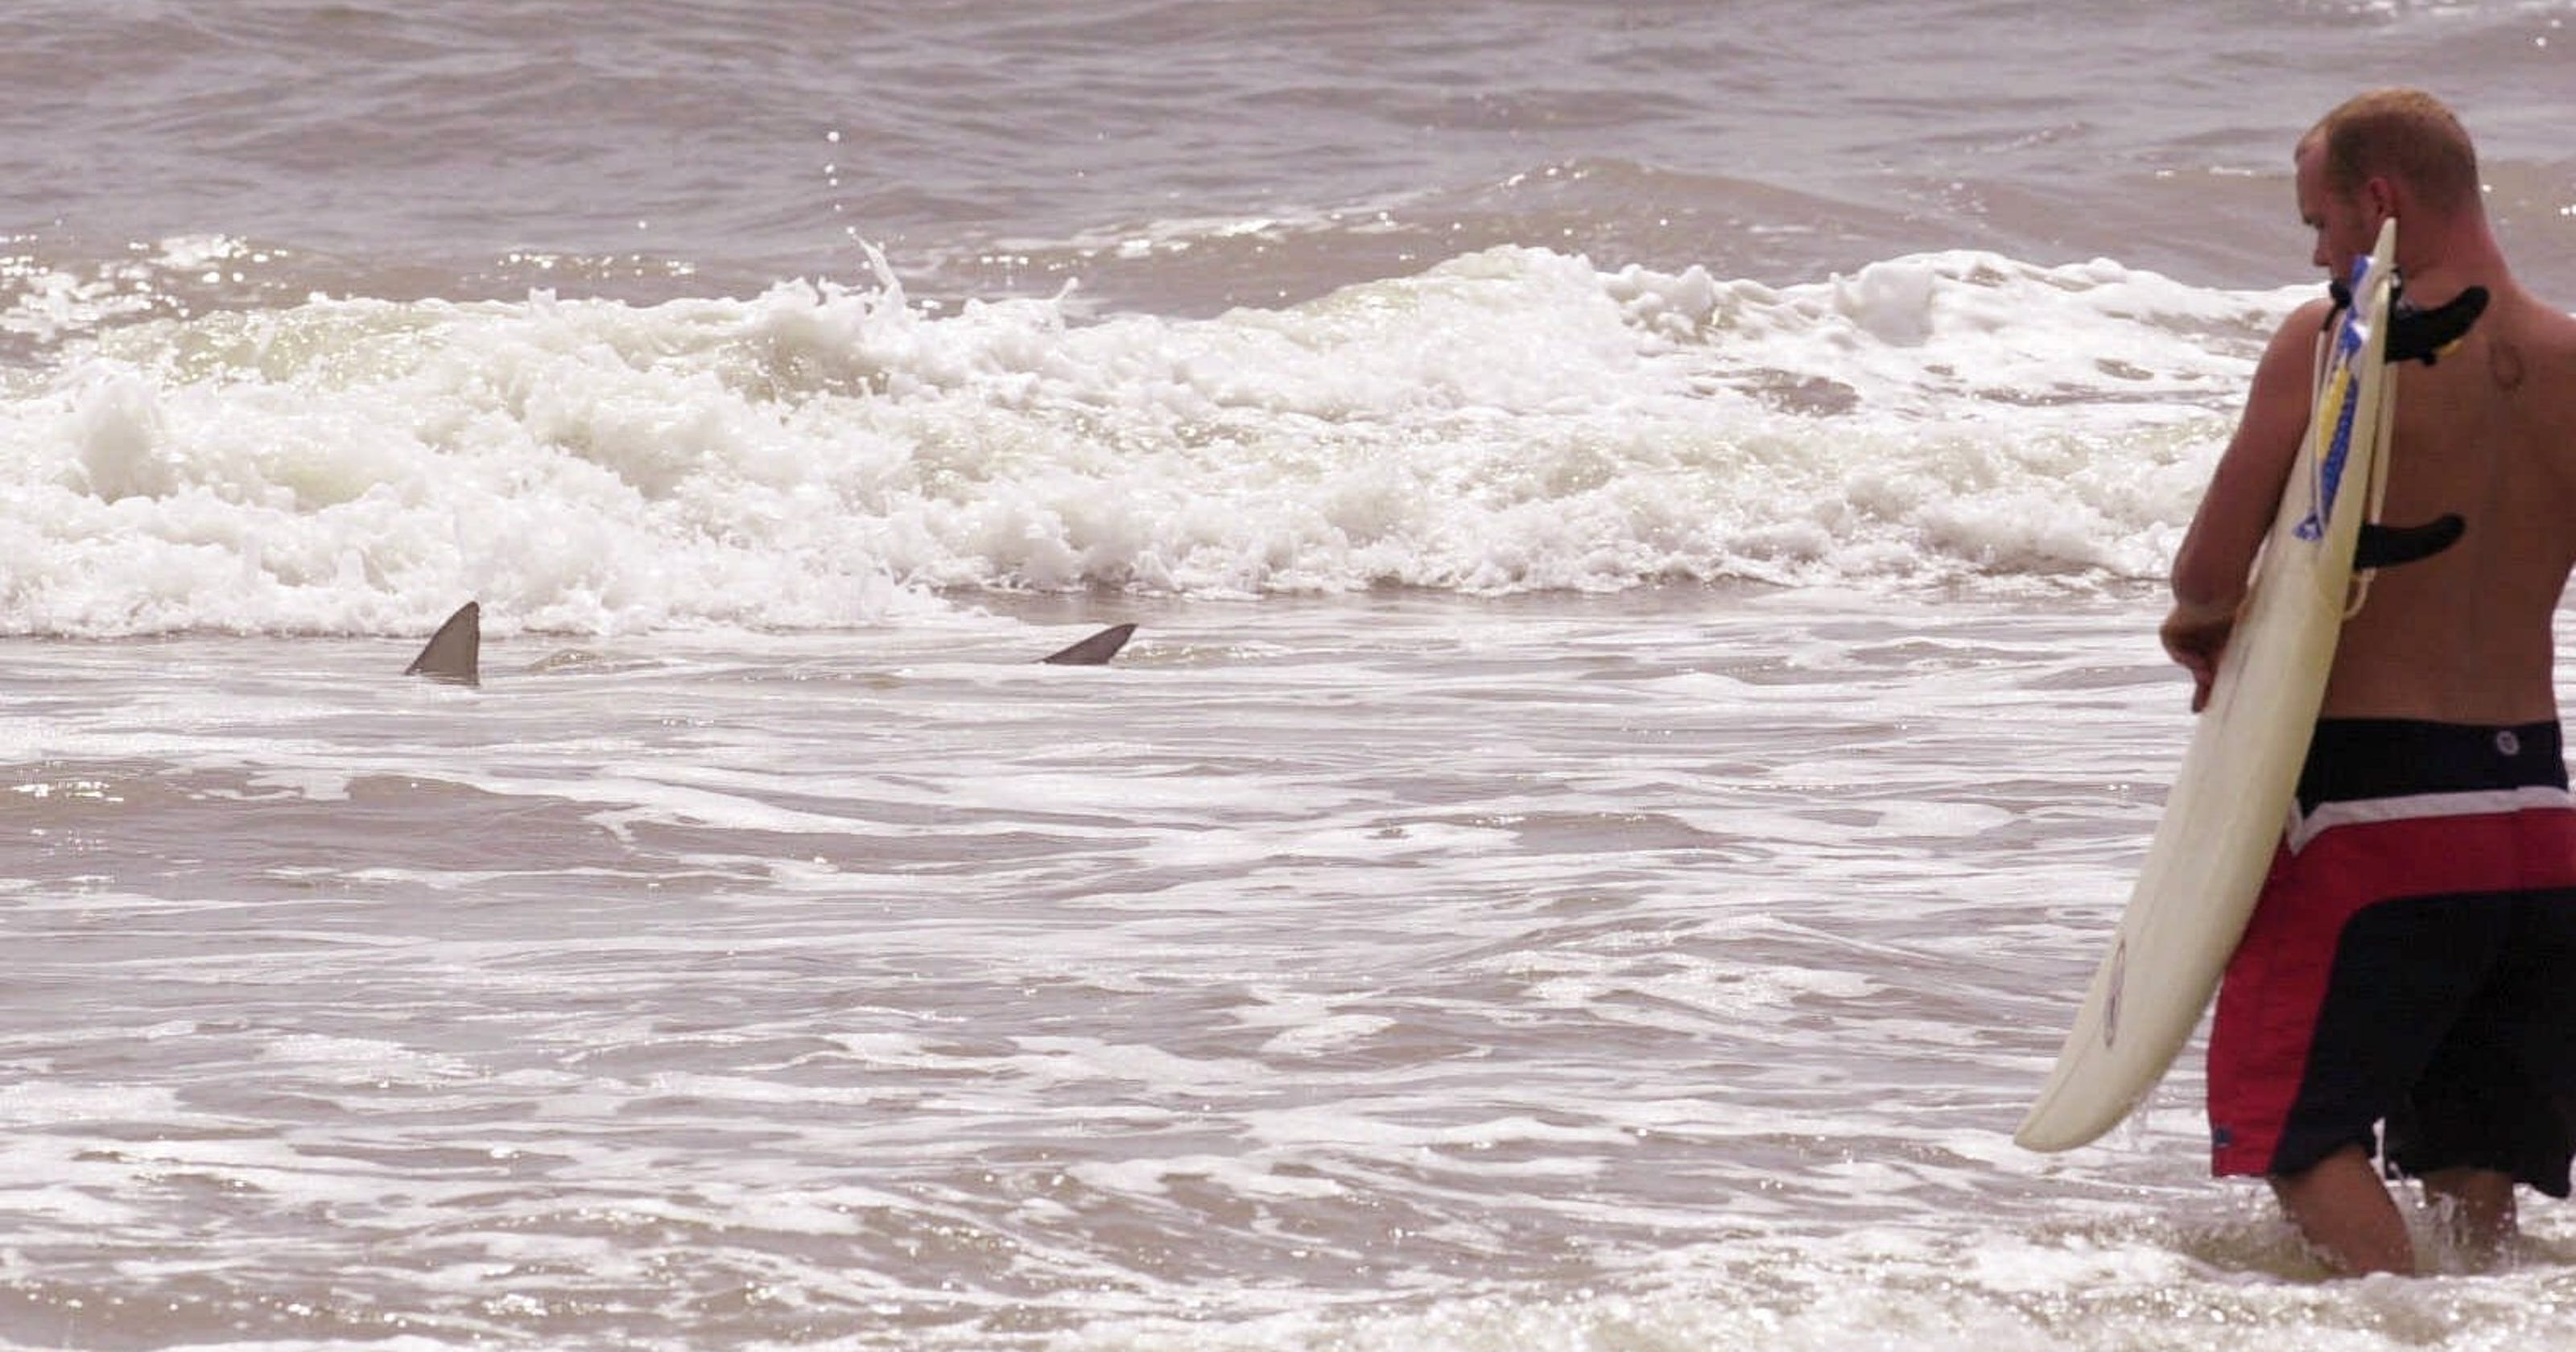 New Smyrna Beach, FL: Third shark bite victim is from Nashville